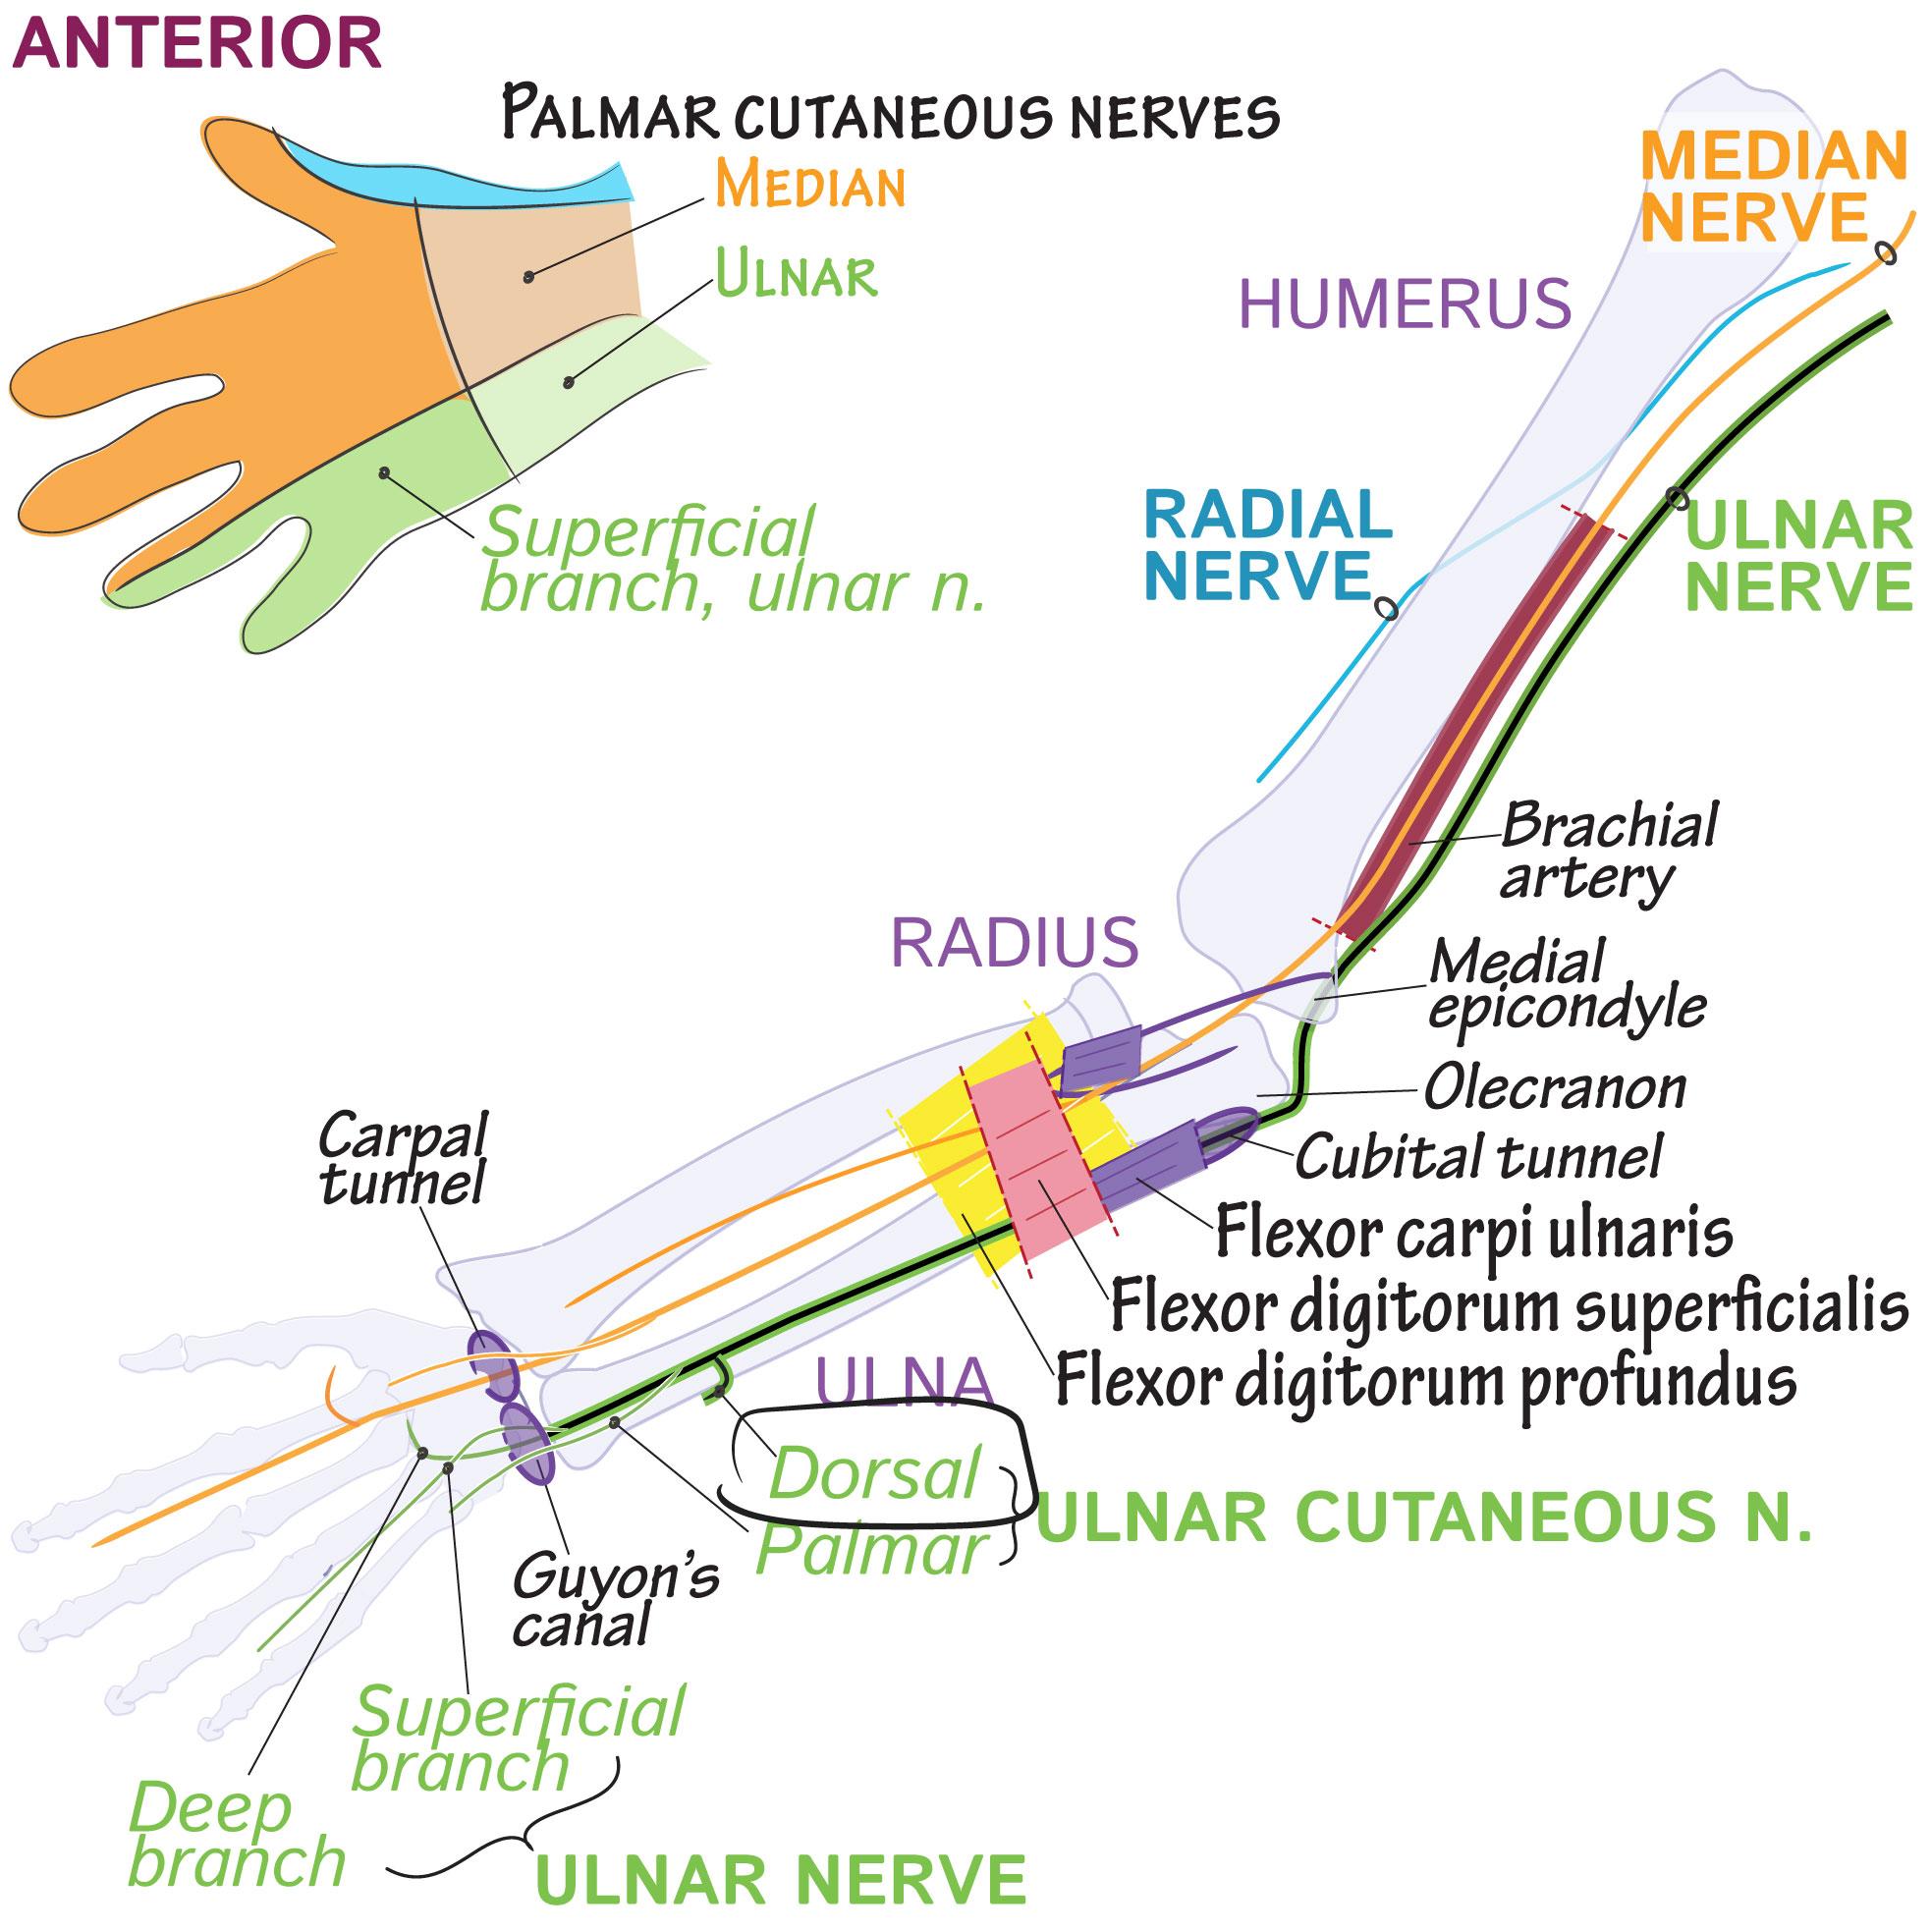 Gross Anatomy Glossary: Dorsal ulnar cutaneous nerve | Draw It to ...